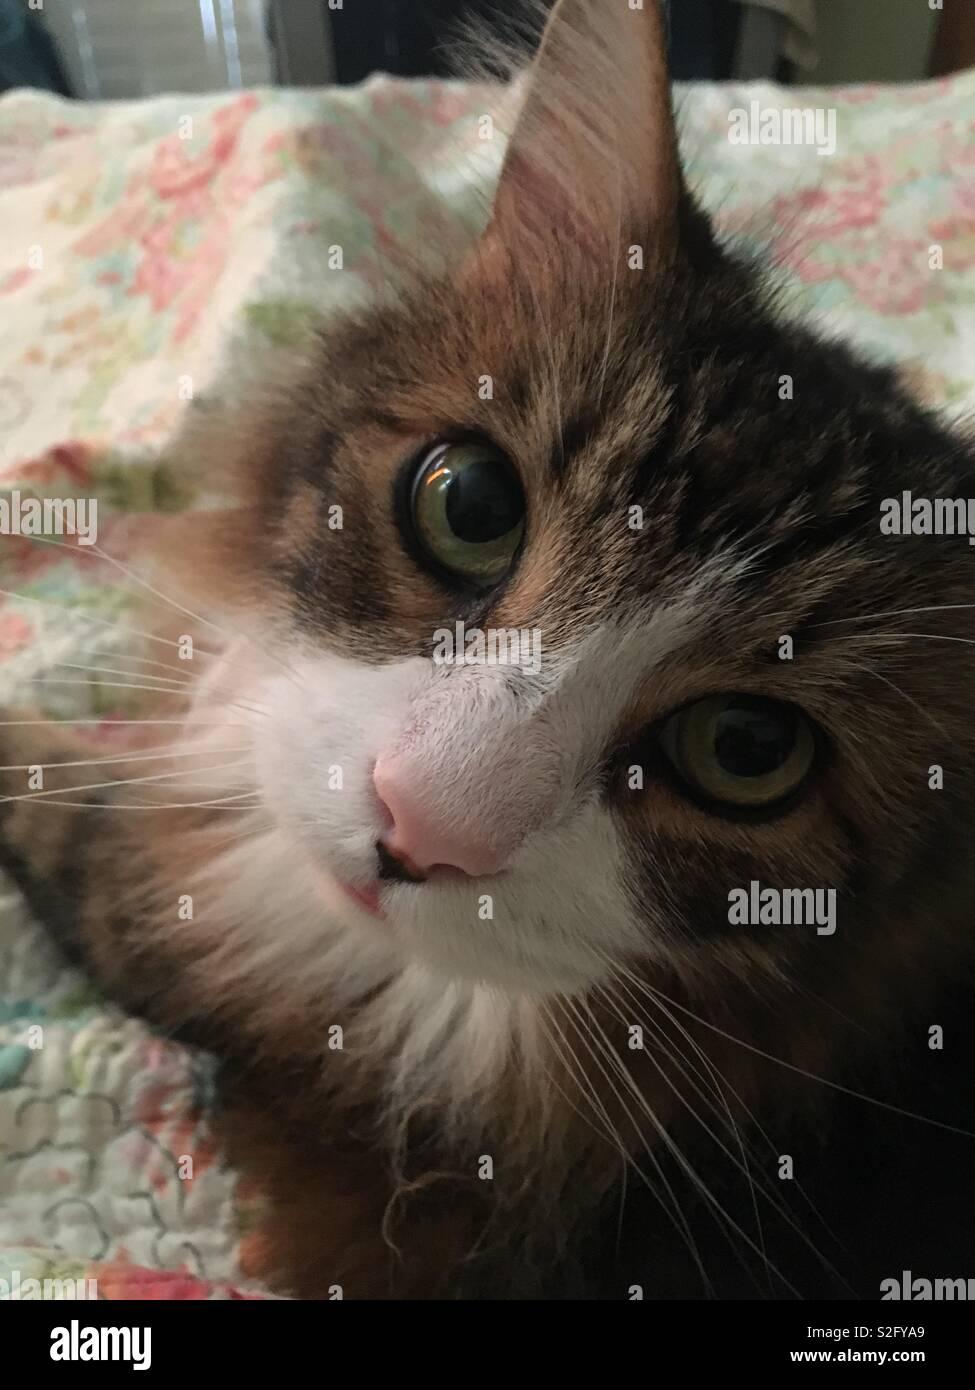 Fluffy cat - Stock Image